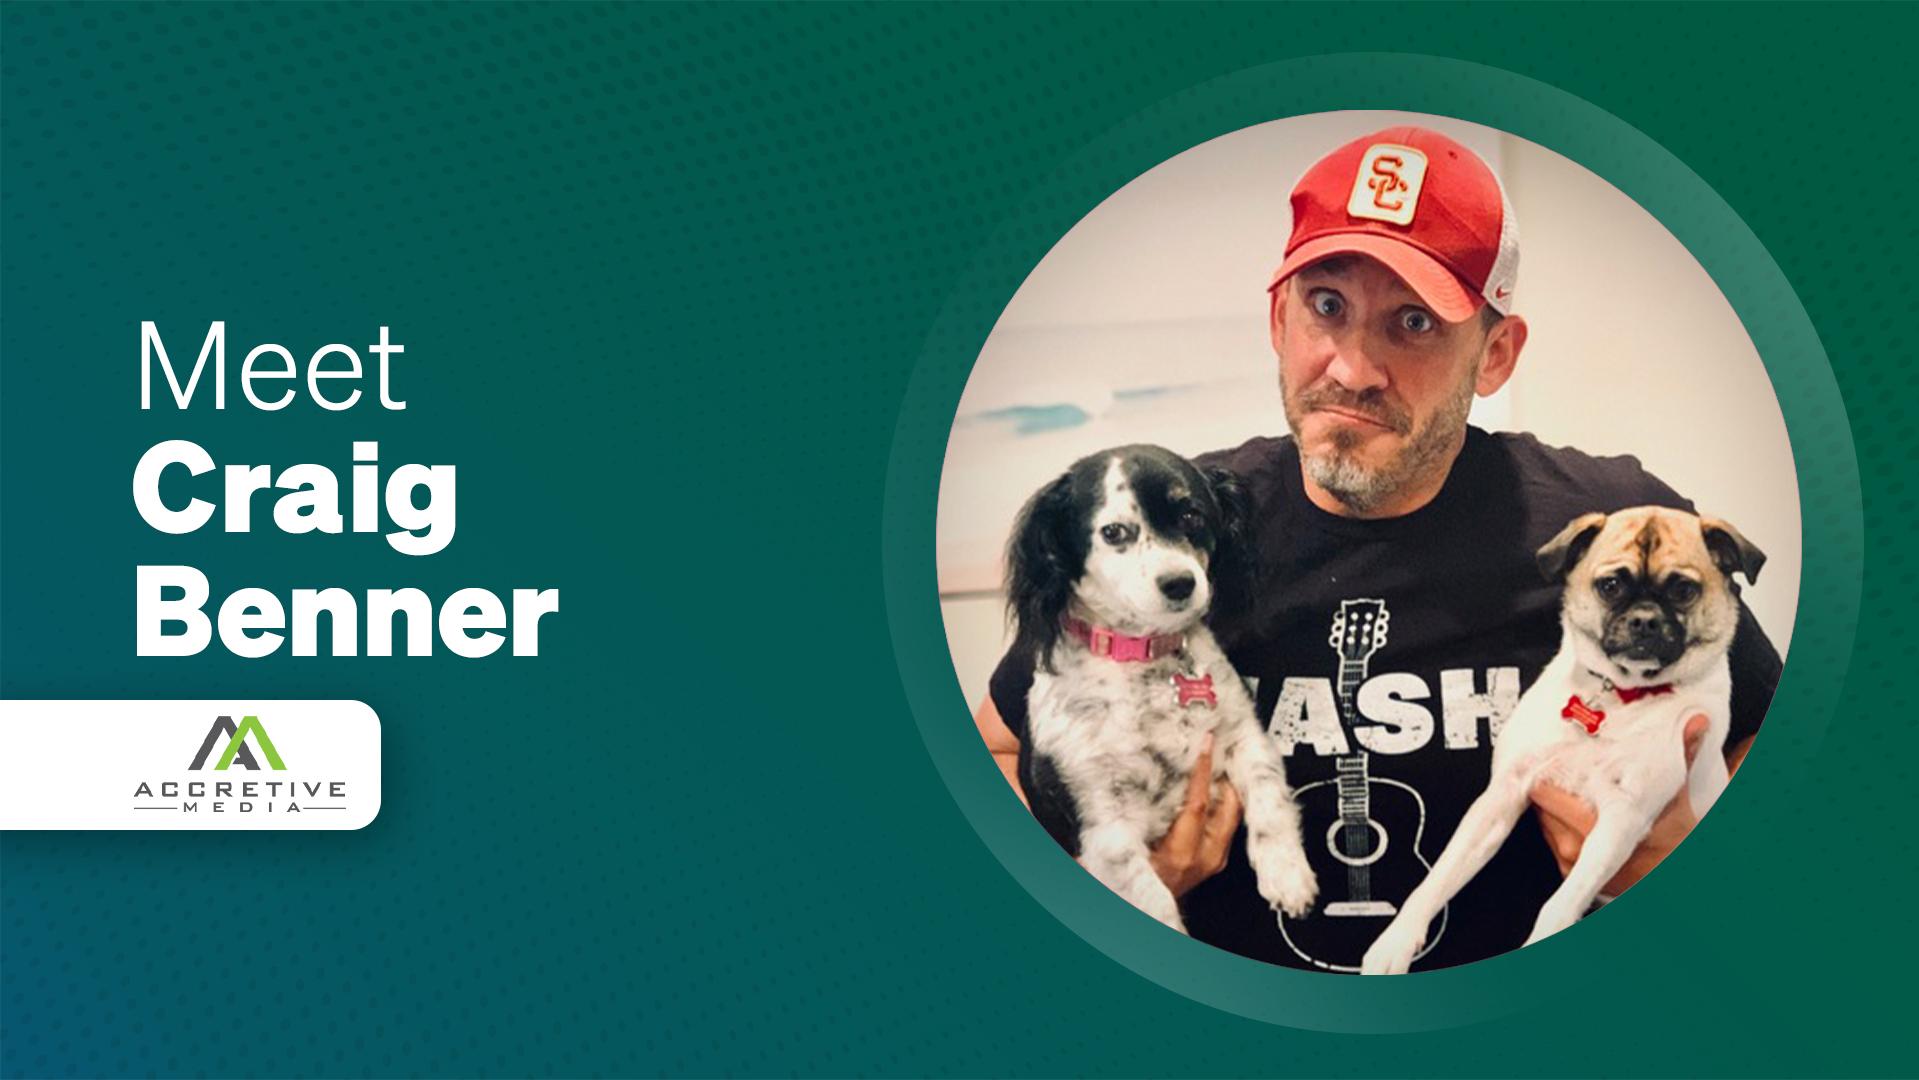 Meet Our Partners: Craig Benner, Accretive Media